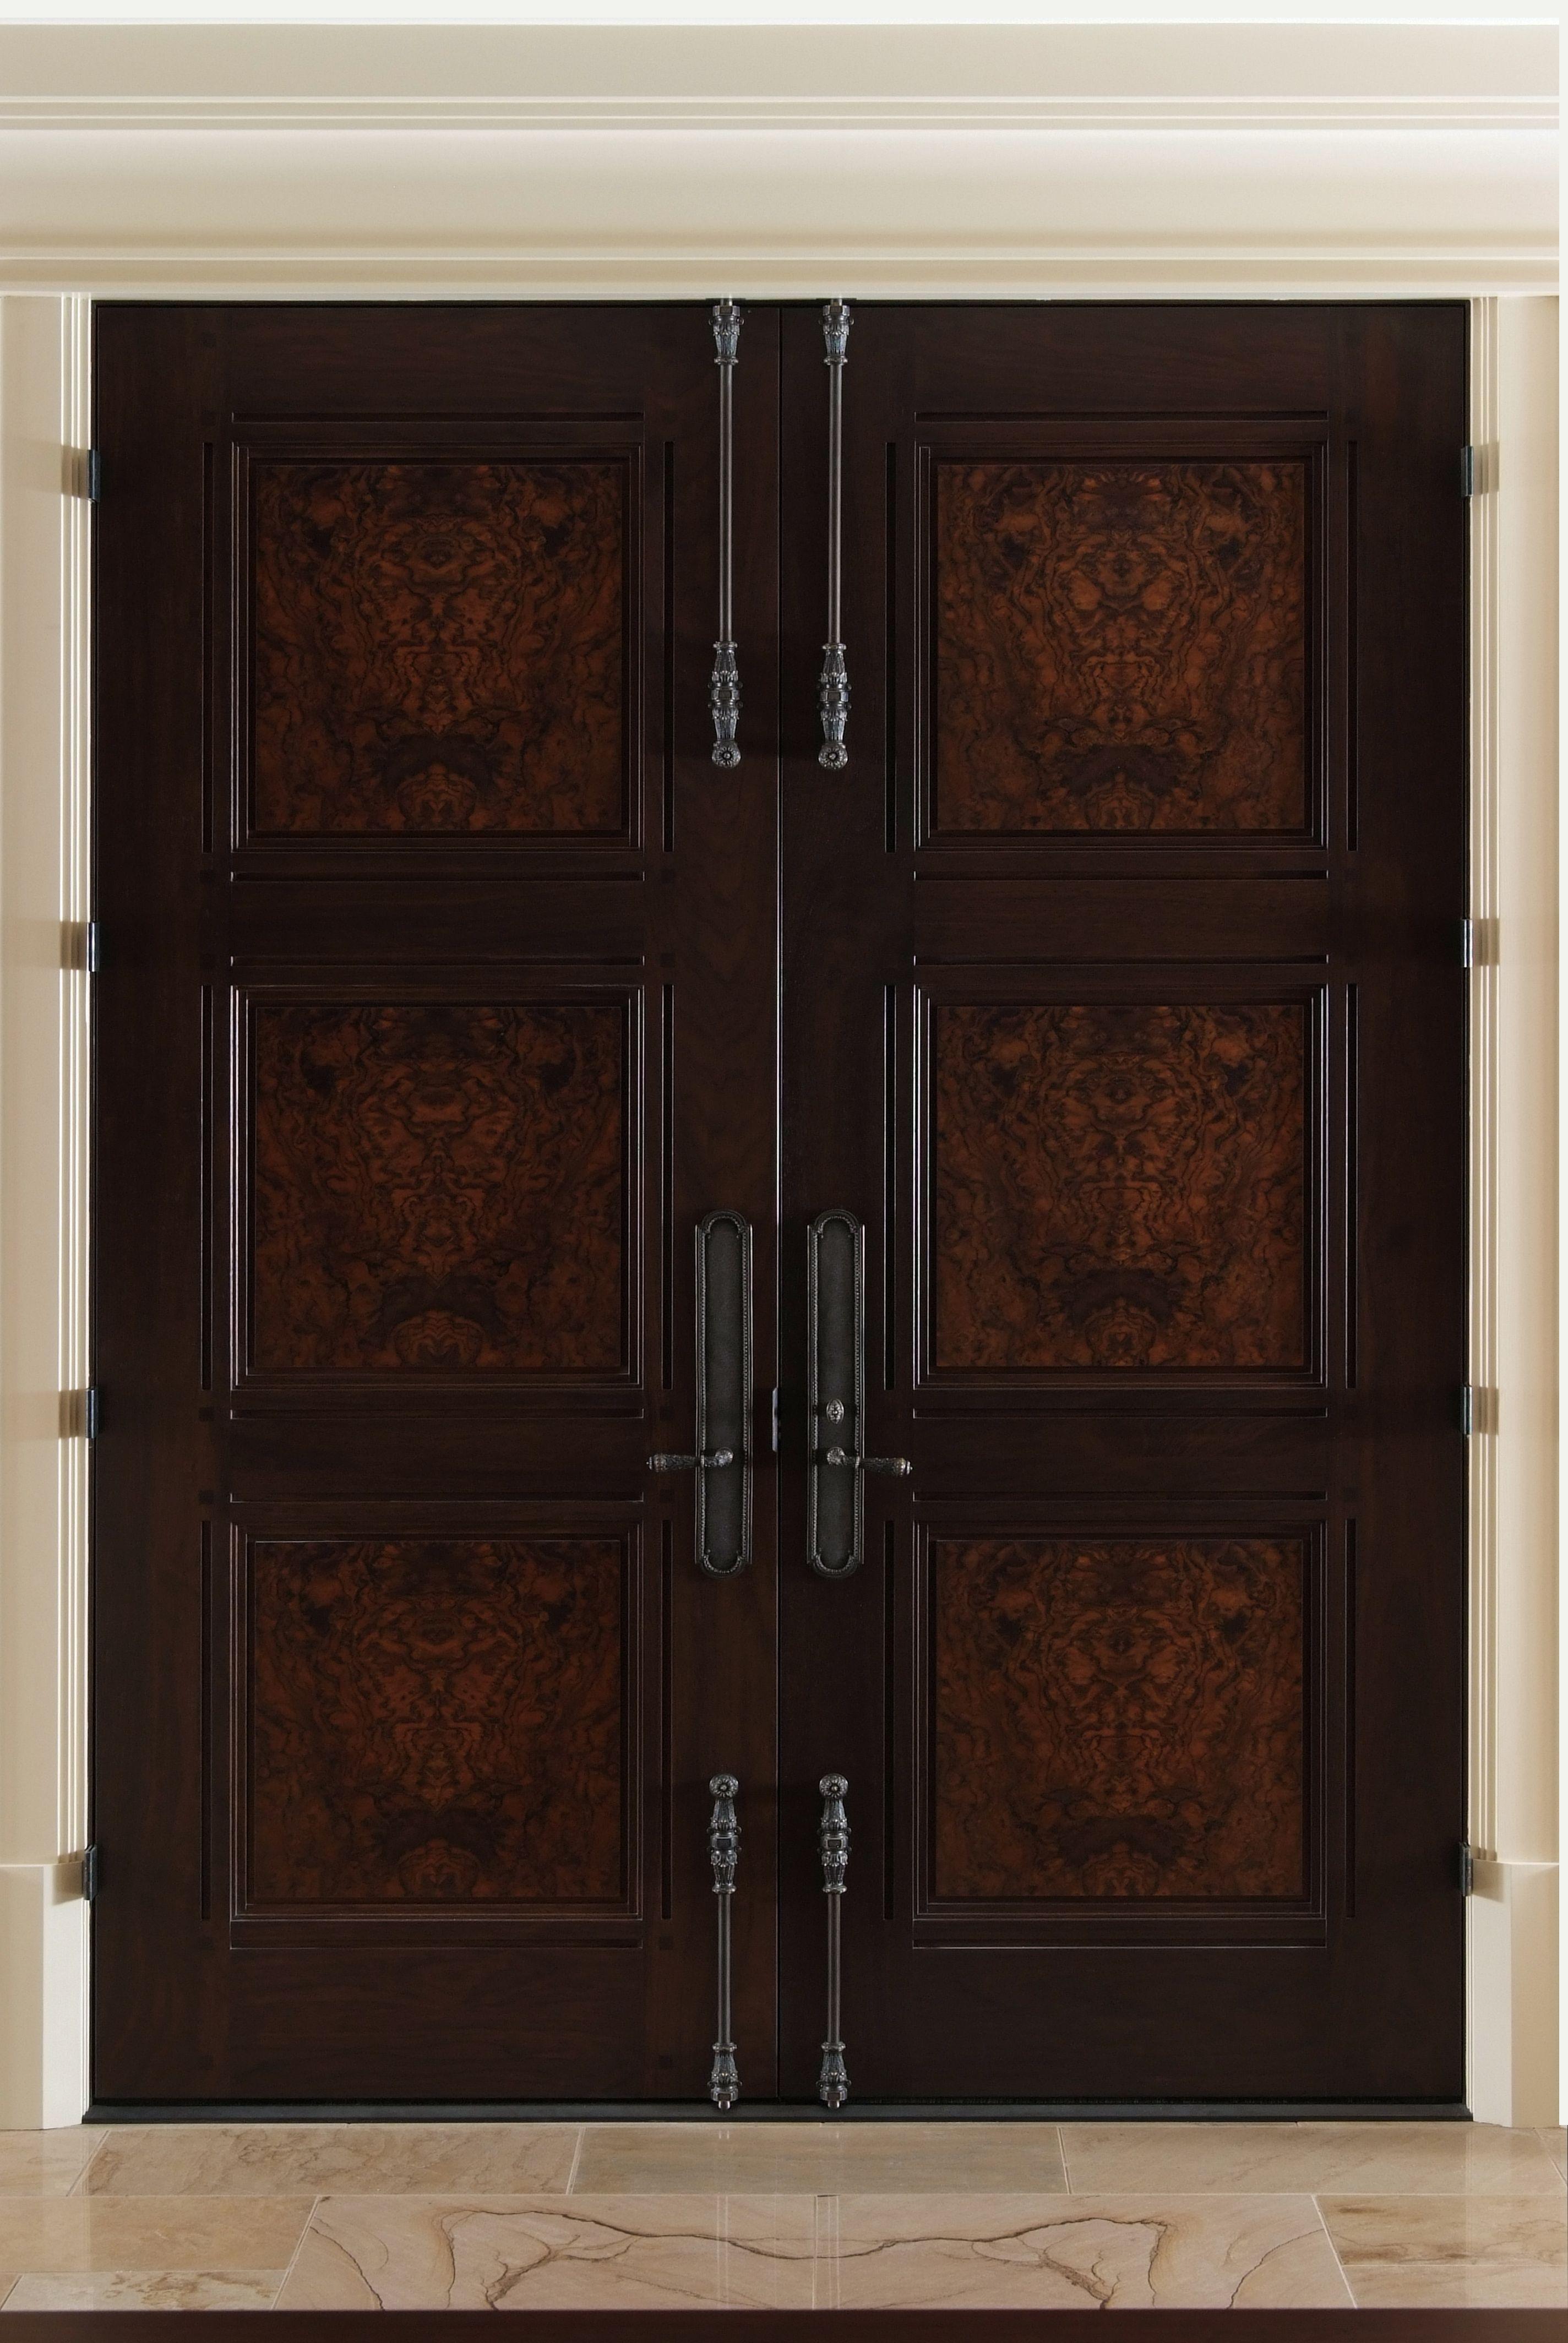 Custom 3 Panel Walnut Double Entry Doors With Burl Walnut Panels.